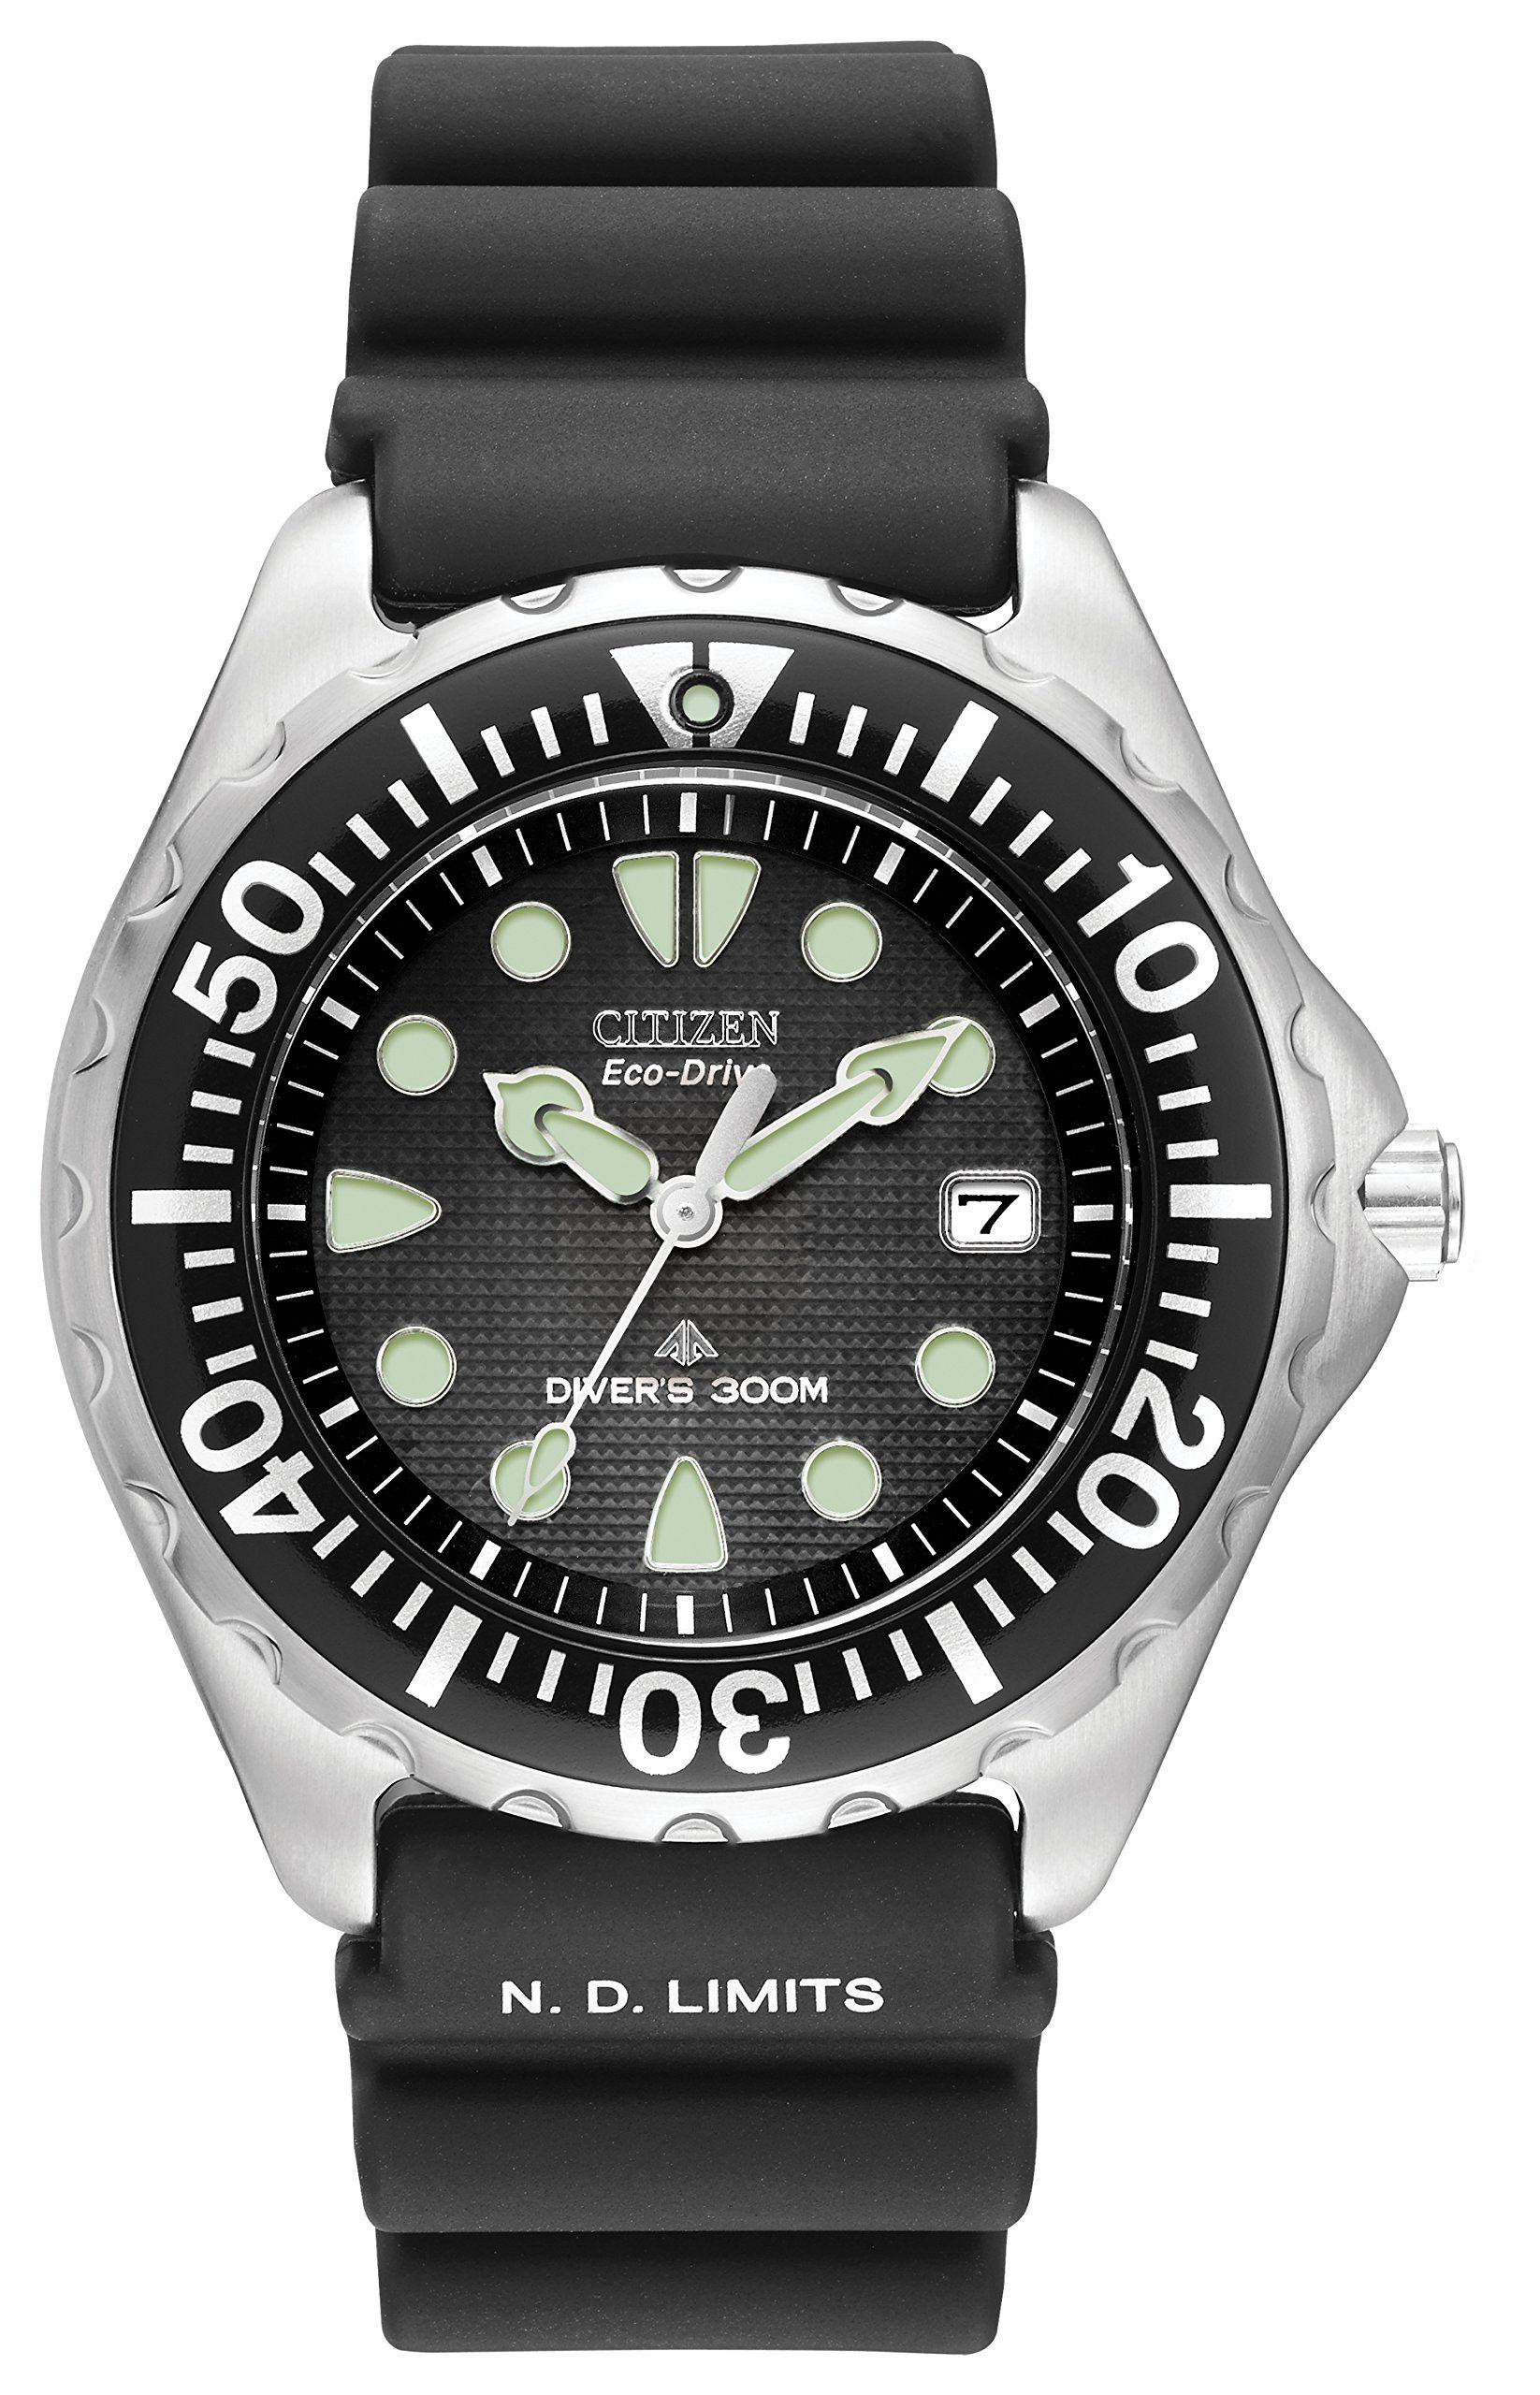 5fd6a4cfd30 Citizen Men s Eco-Drive 300 Meter Professional Diver Watch  BN0000-04H   Citizen  Amazon.co.uk  Watches